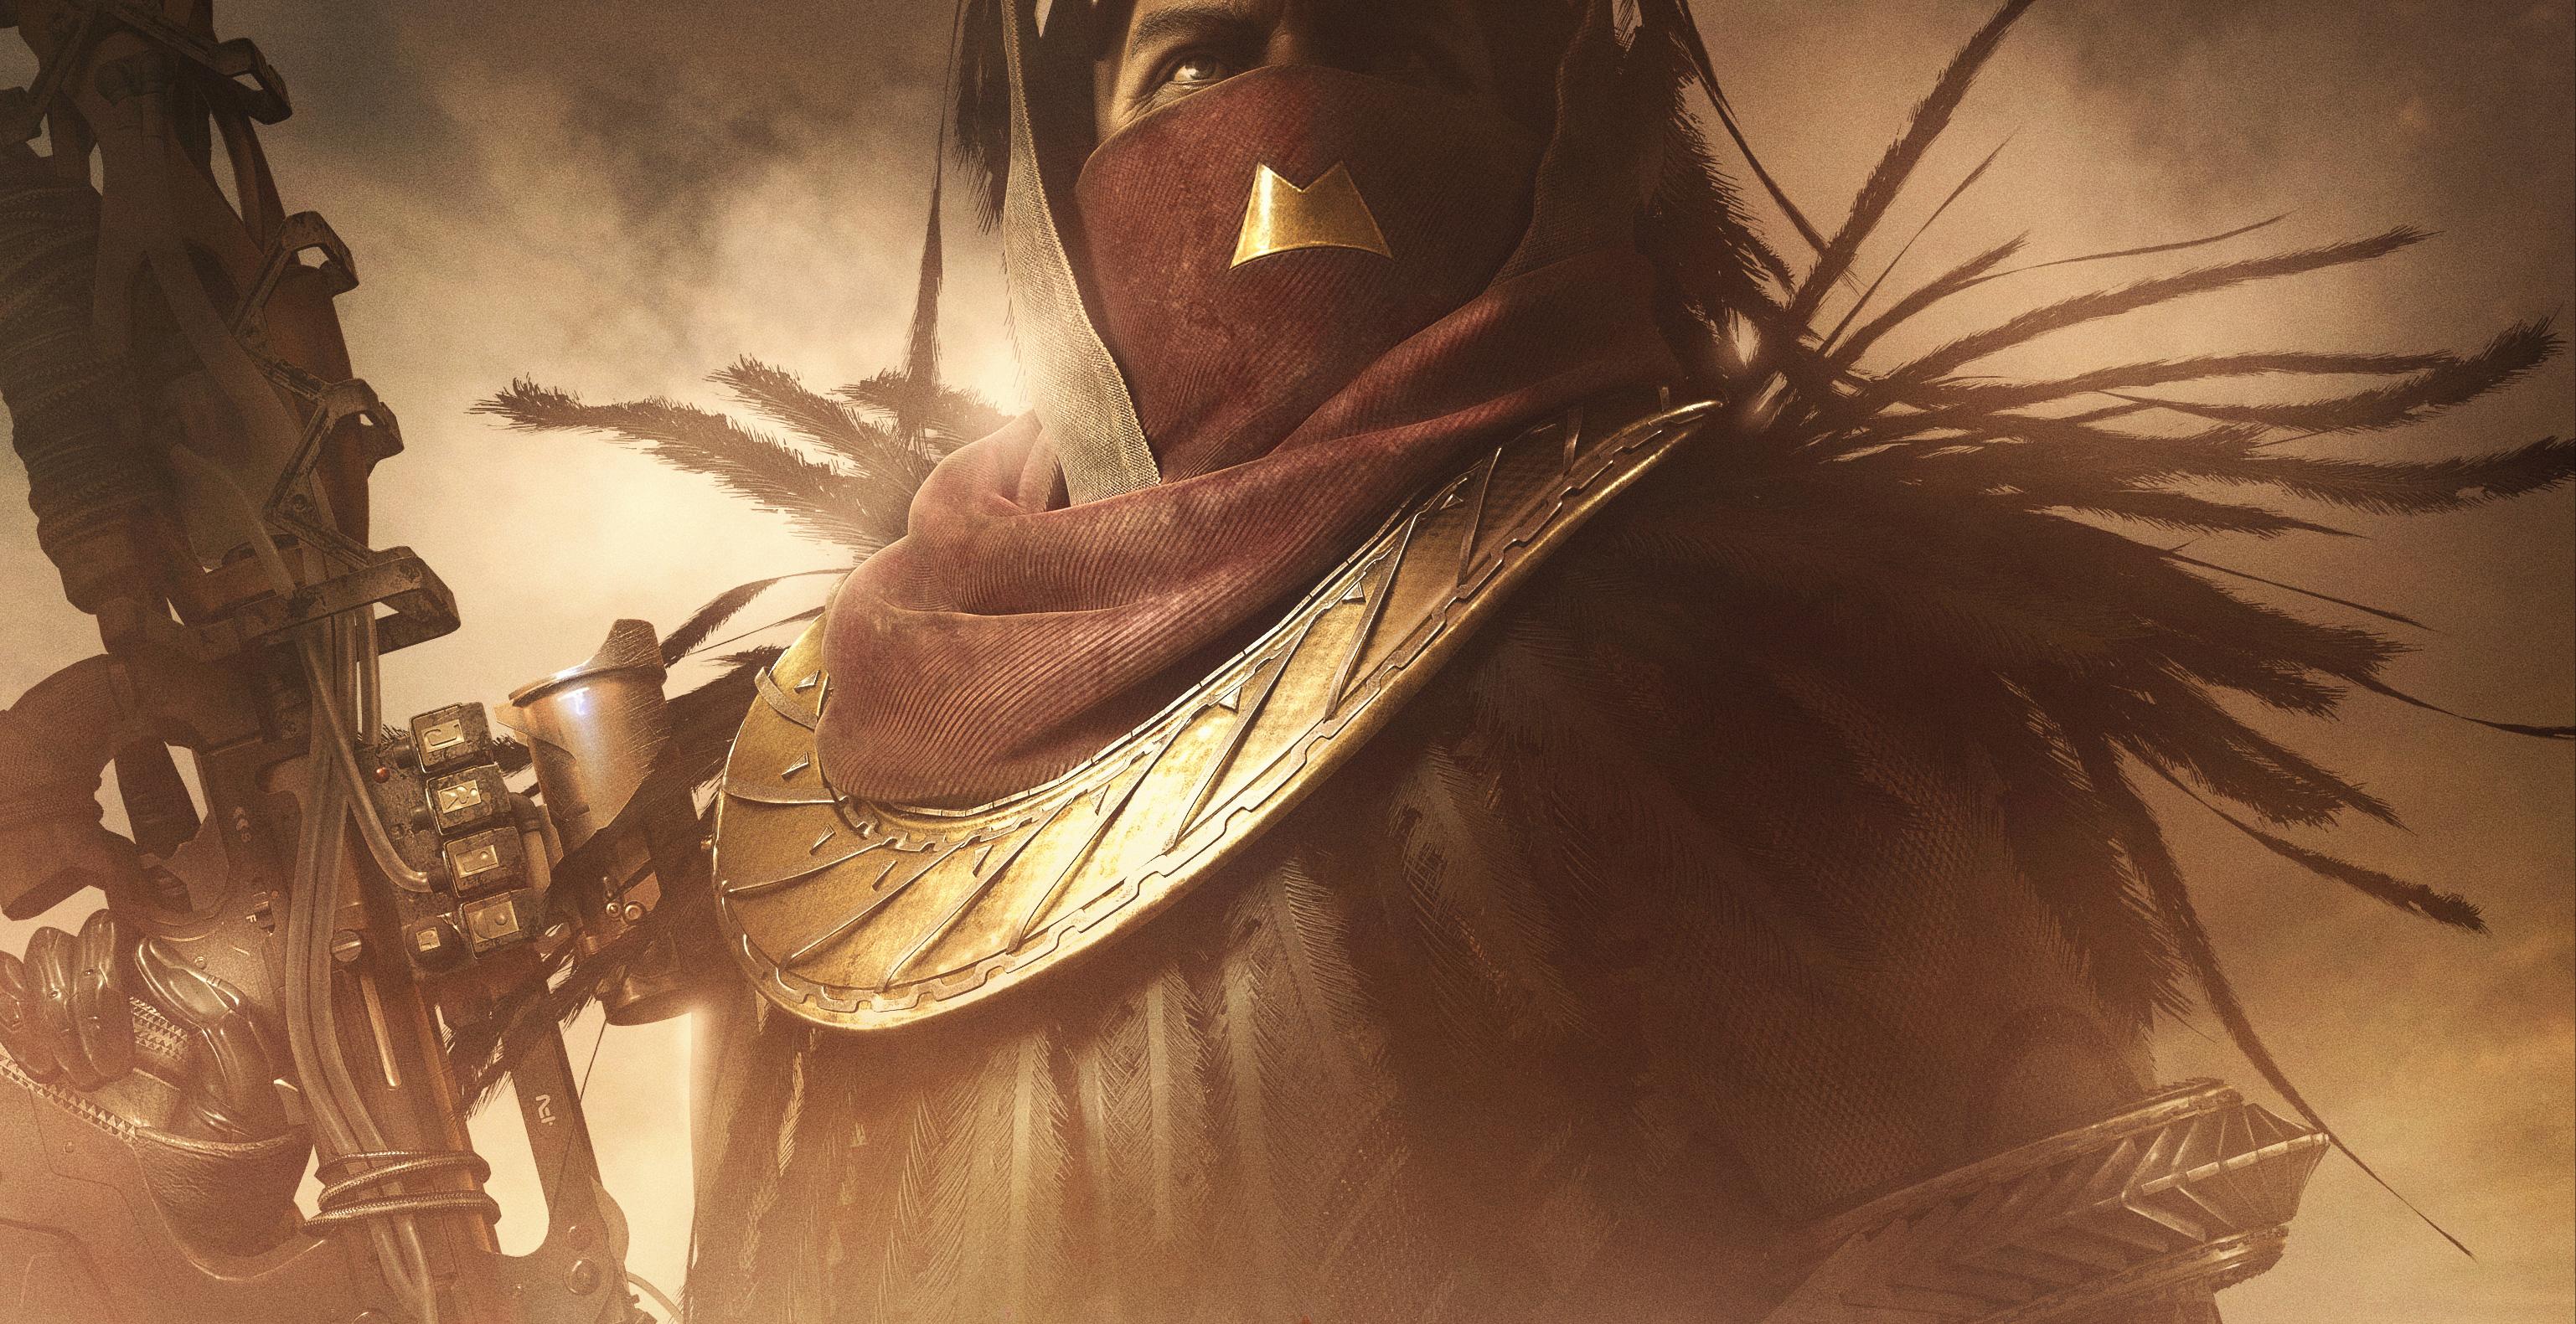 Destiny 2 Expansion 1 Curse Of Osiris 4k, HD Games, 4k ...